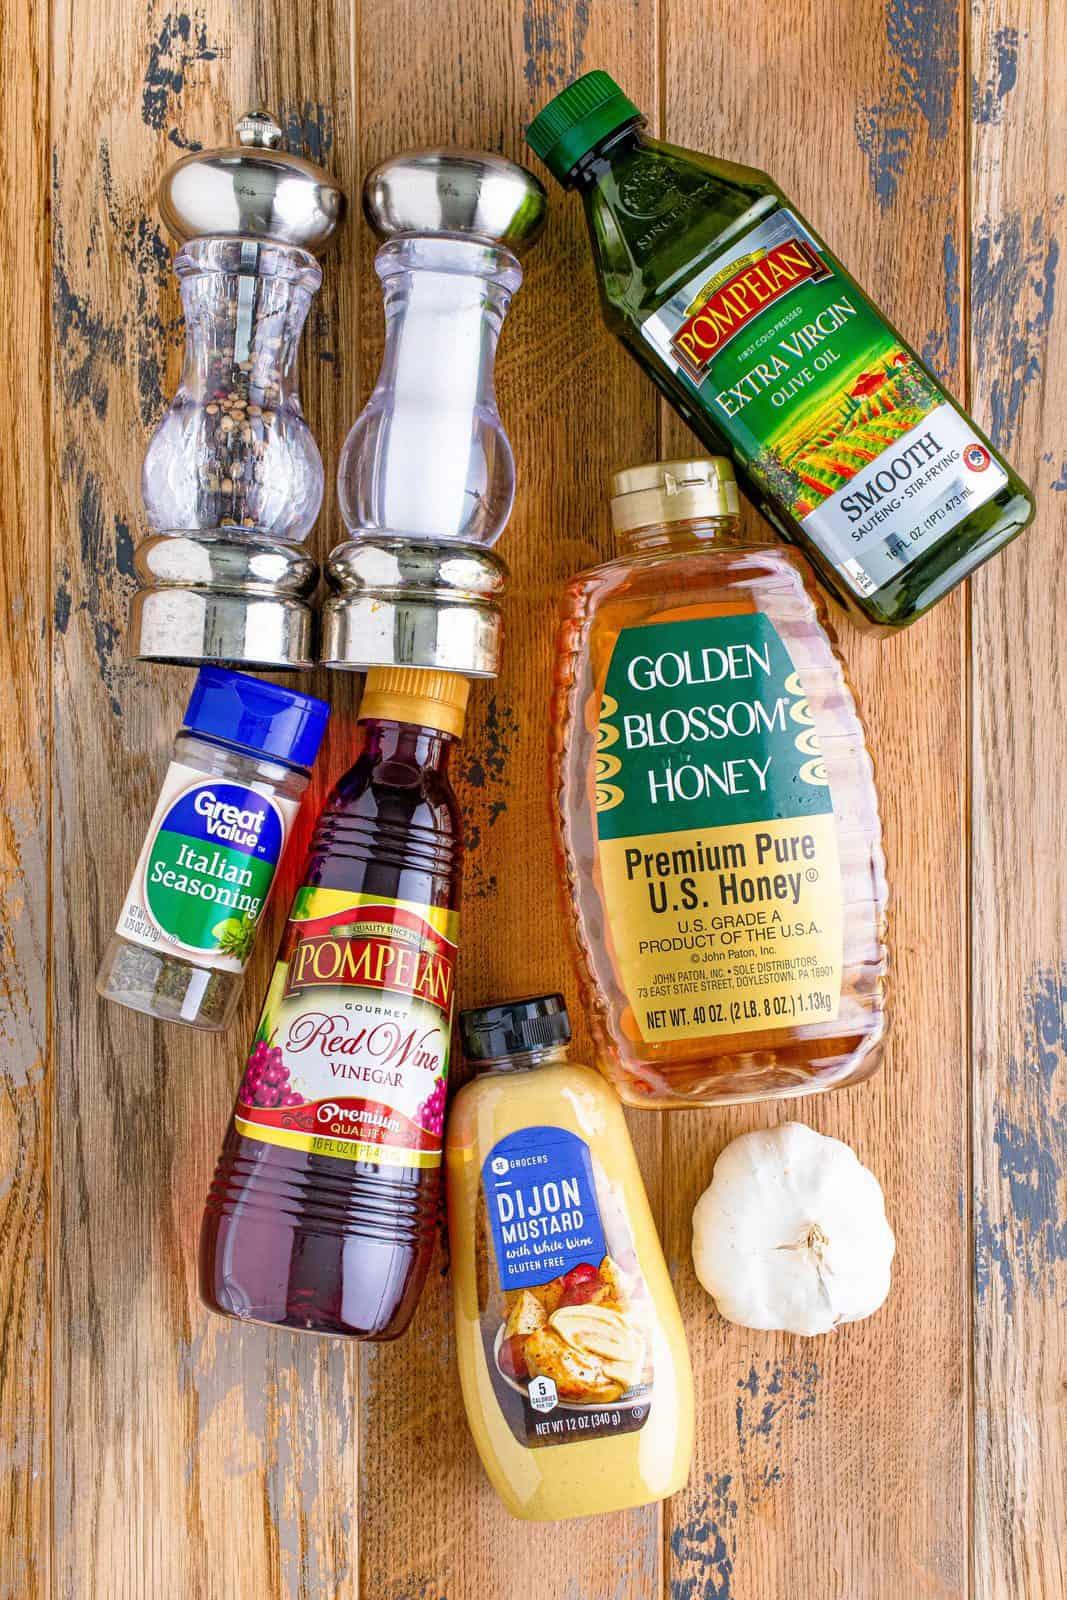 salad dressing ingredients needed: olive oil, red wine vinegar, honey, dijon mustard, Italian seasoning, garlic, salt and pepper.